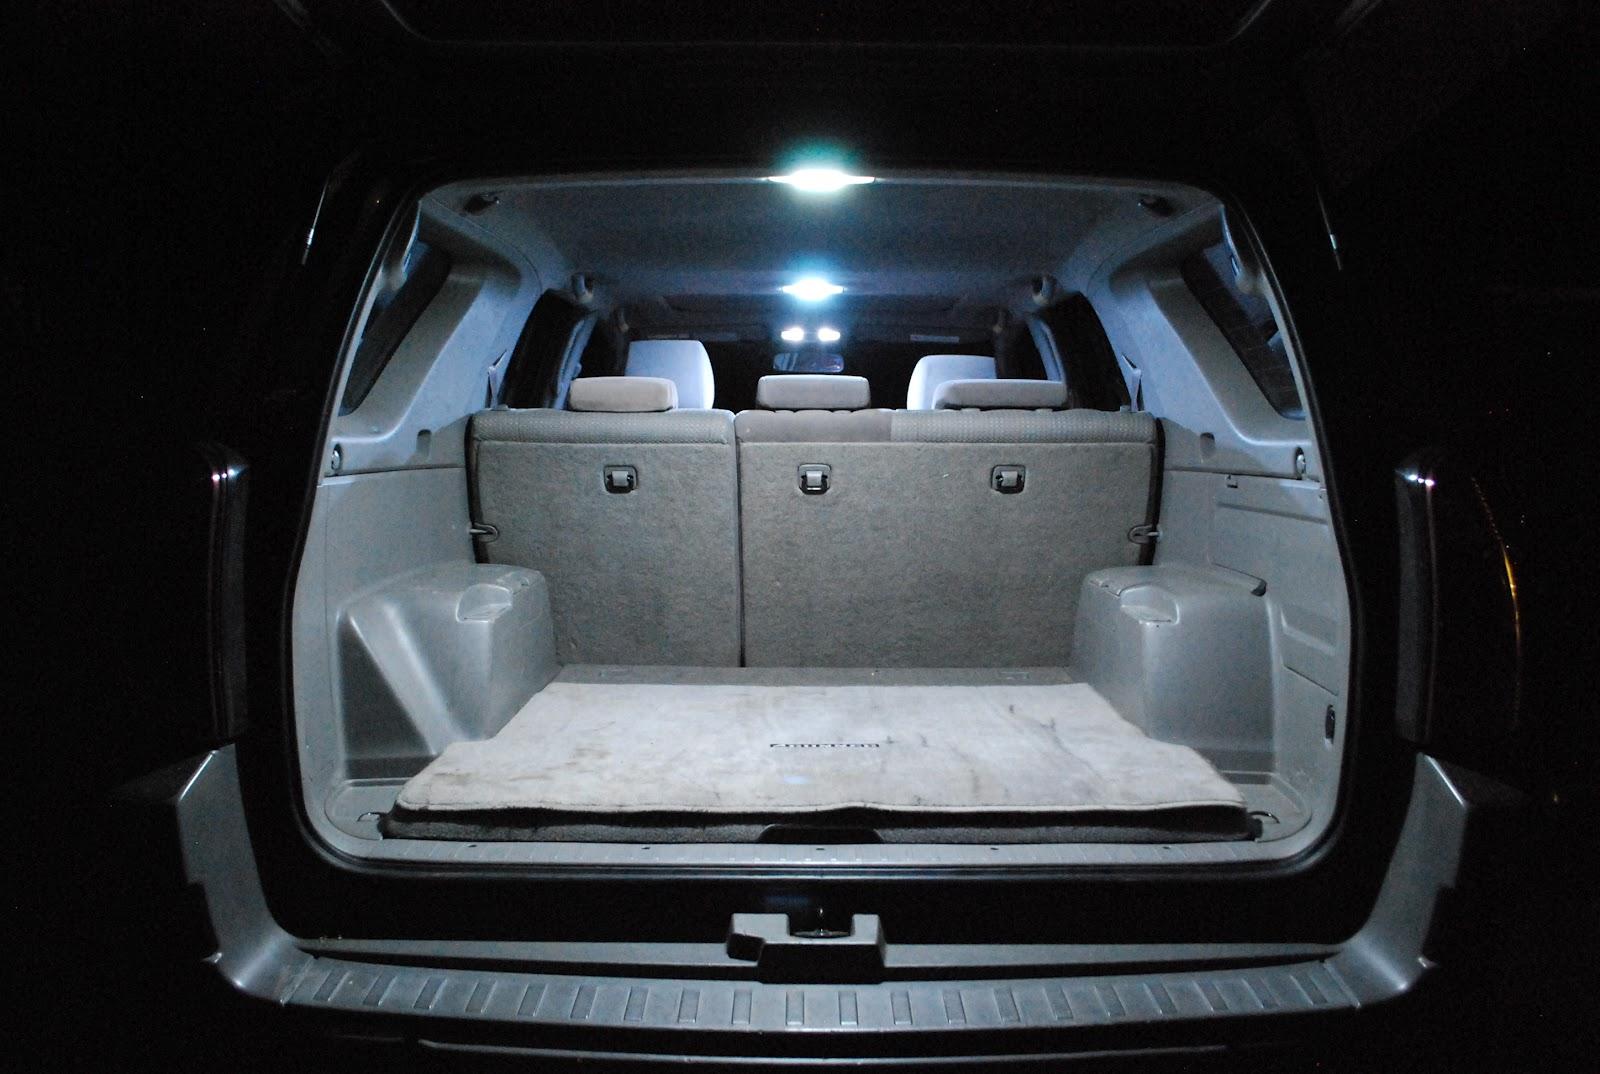 4runner interior led kits ih8mud forum - Kit cultivo interior led ...